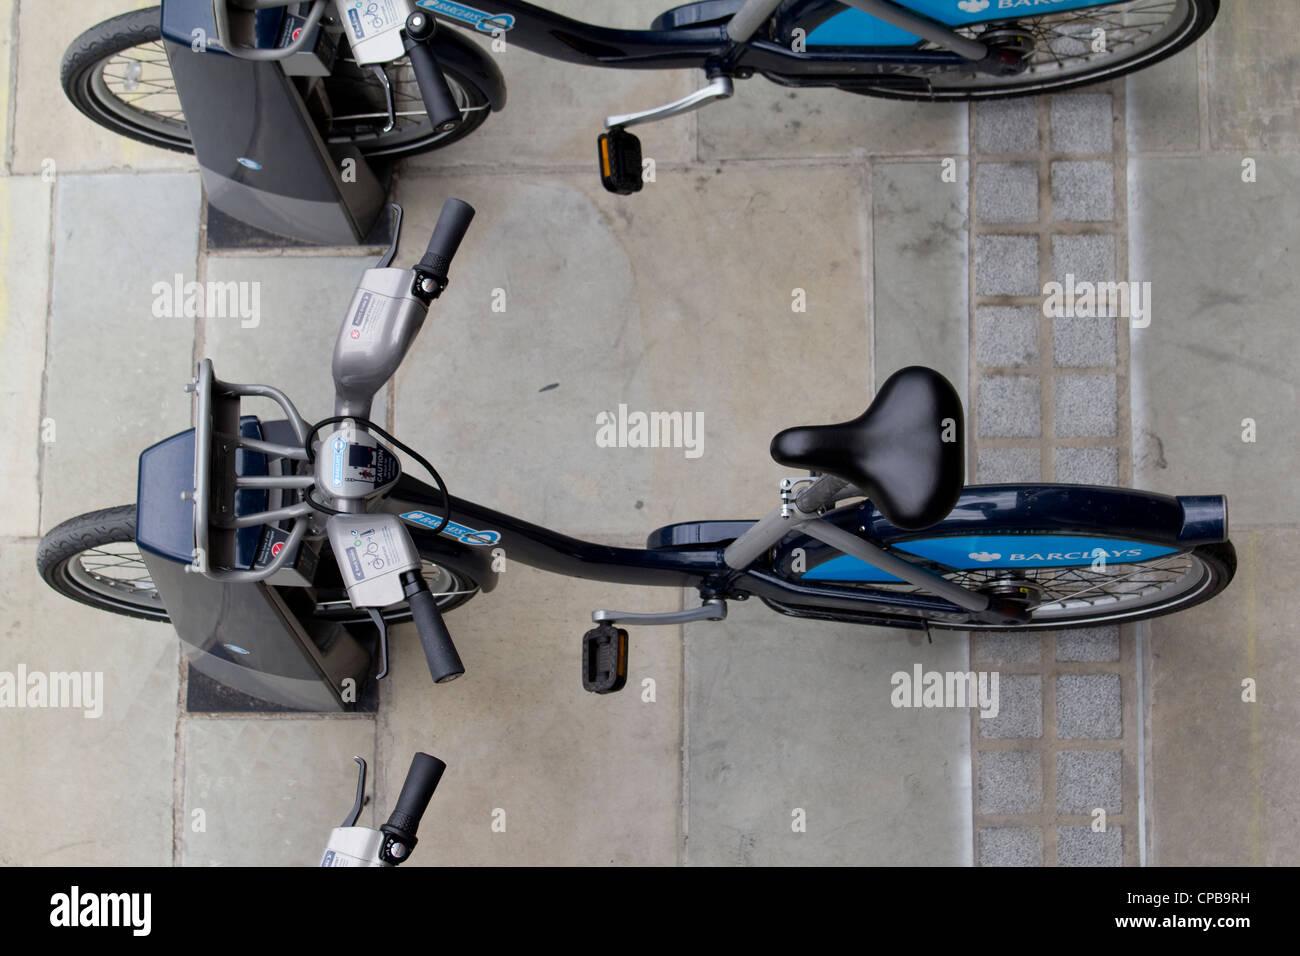 Boris bikes, london cycle rental scheme, blue barclays bicycles - Stock Image